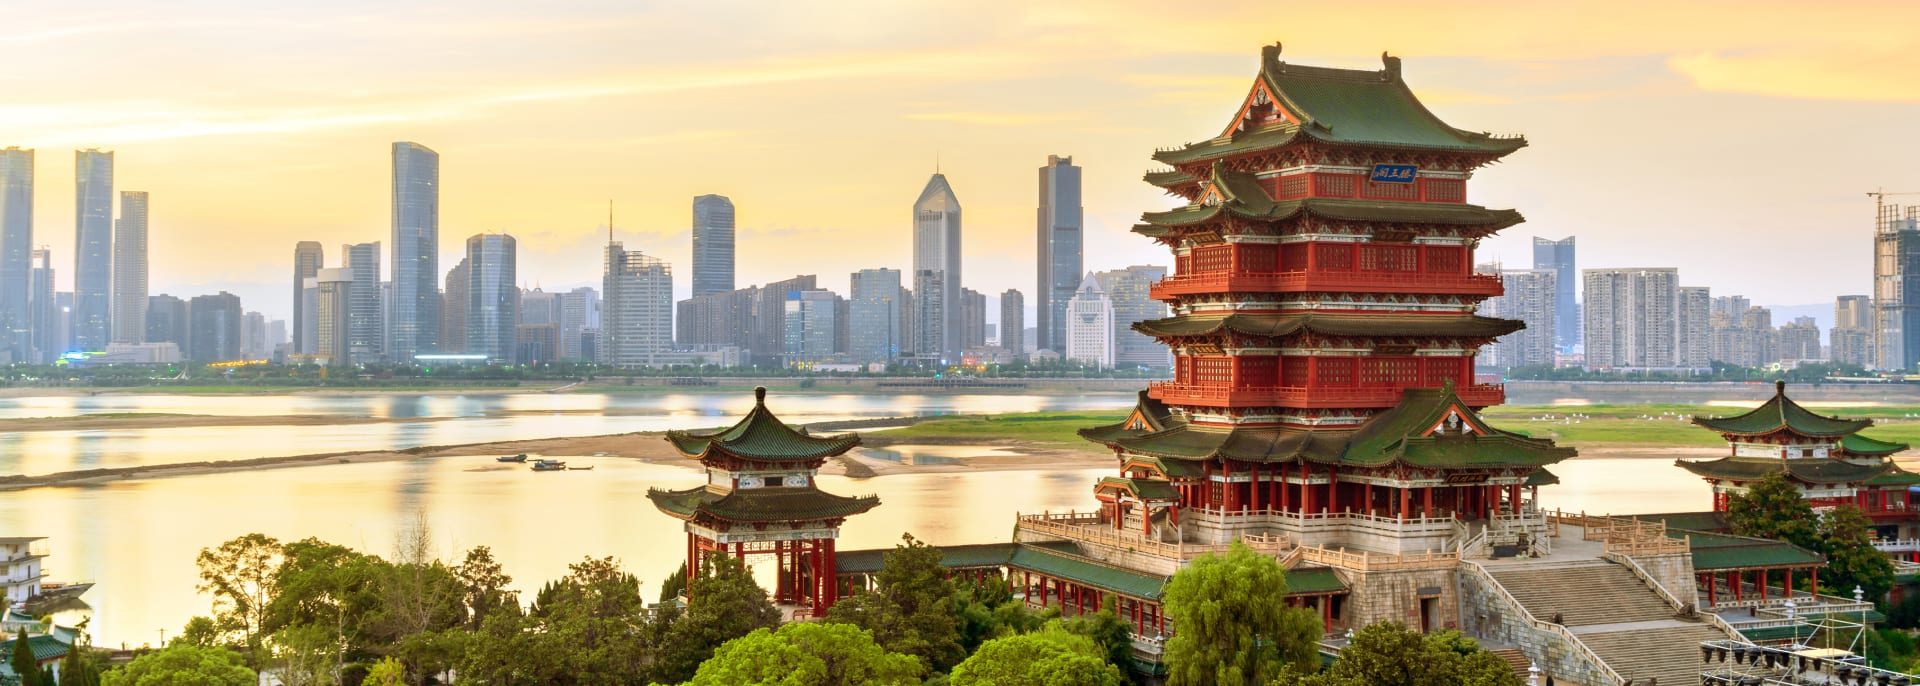 Tengwang Pavillon, China